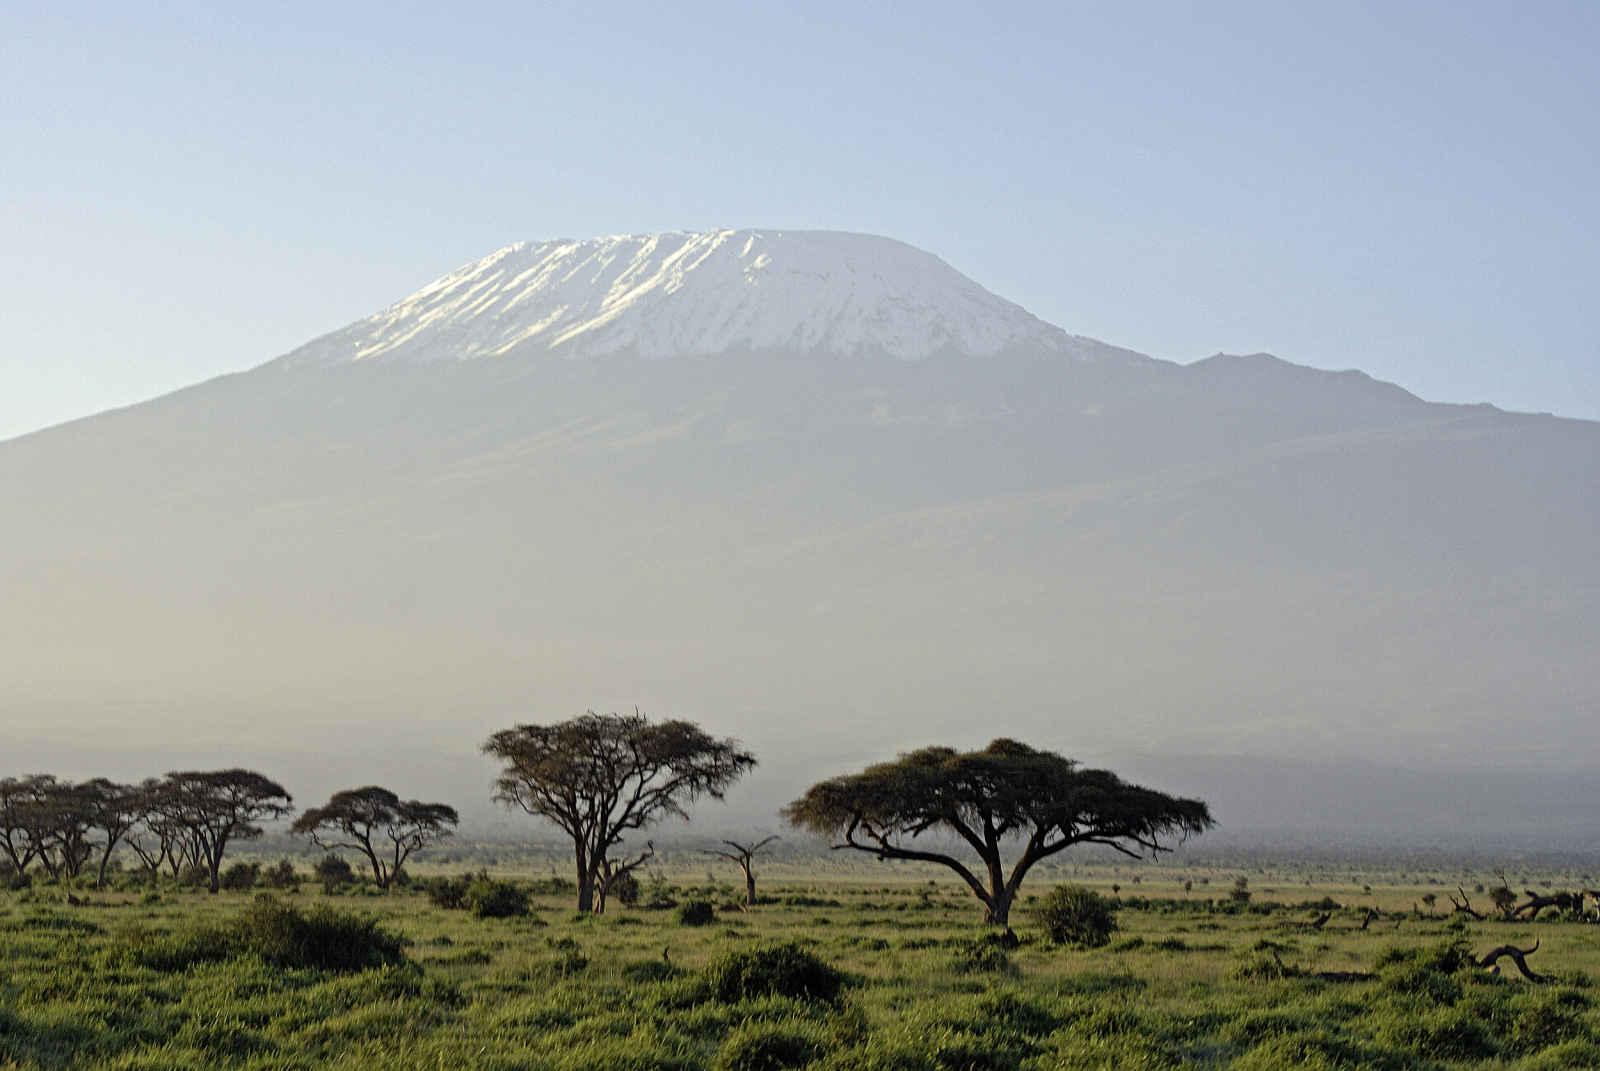 Tanzanie : Souvenirs du Kilimandjaro